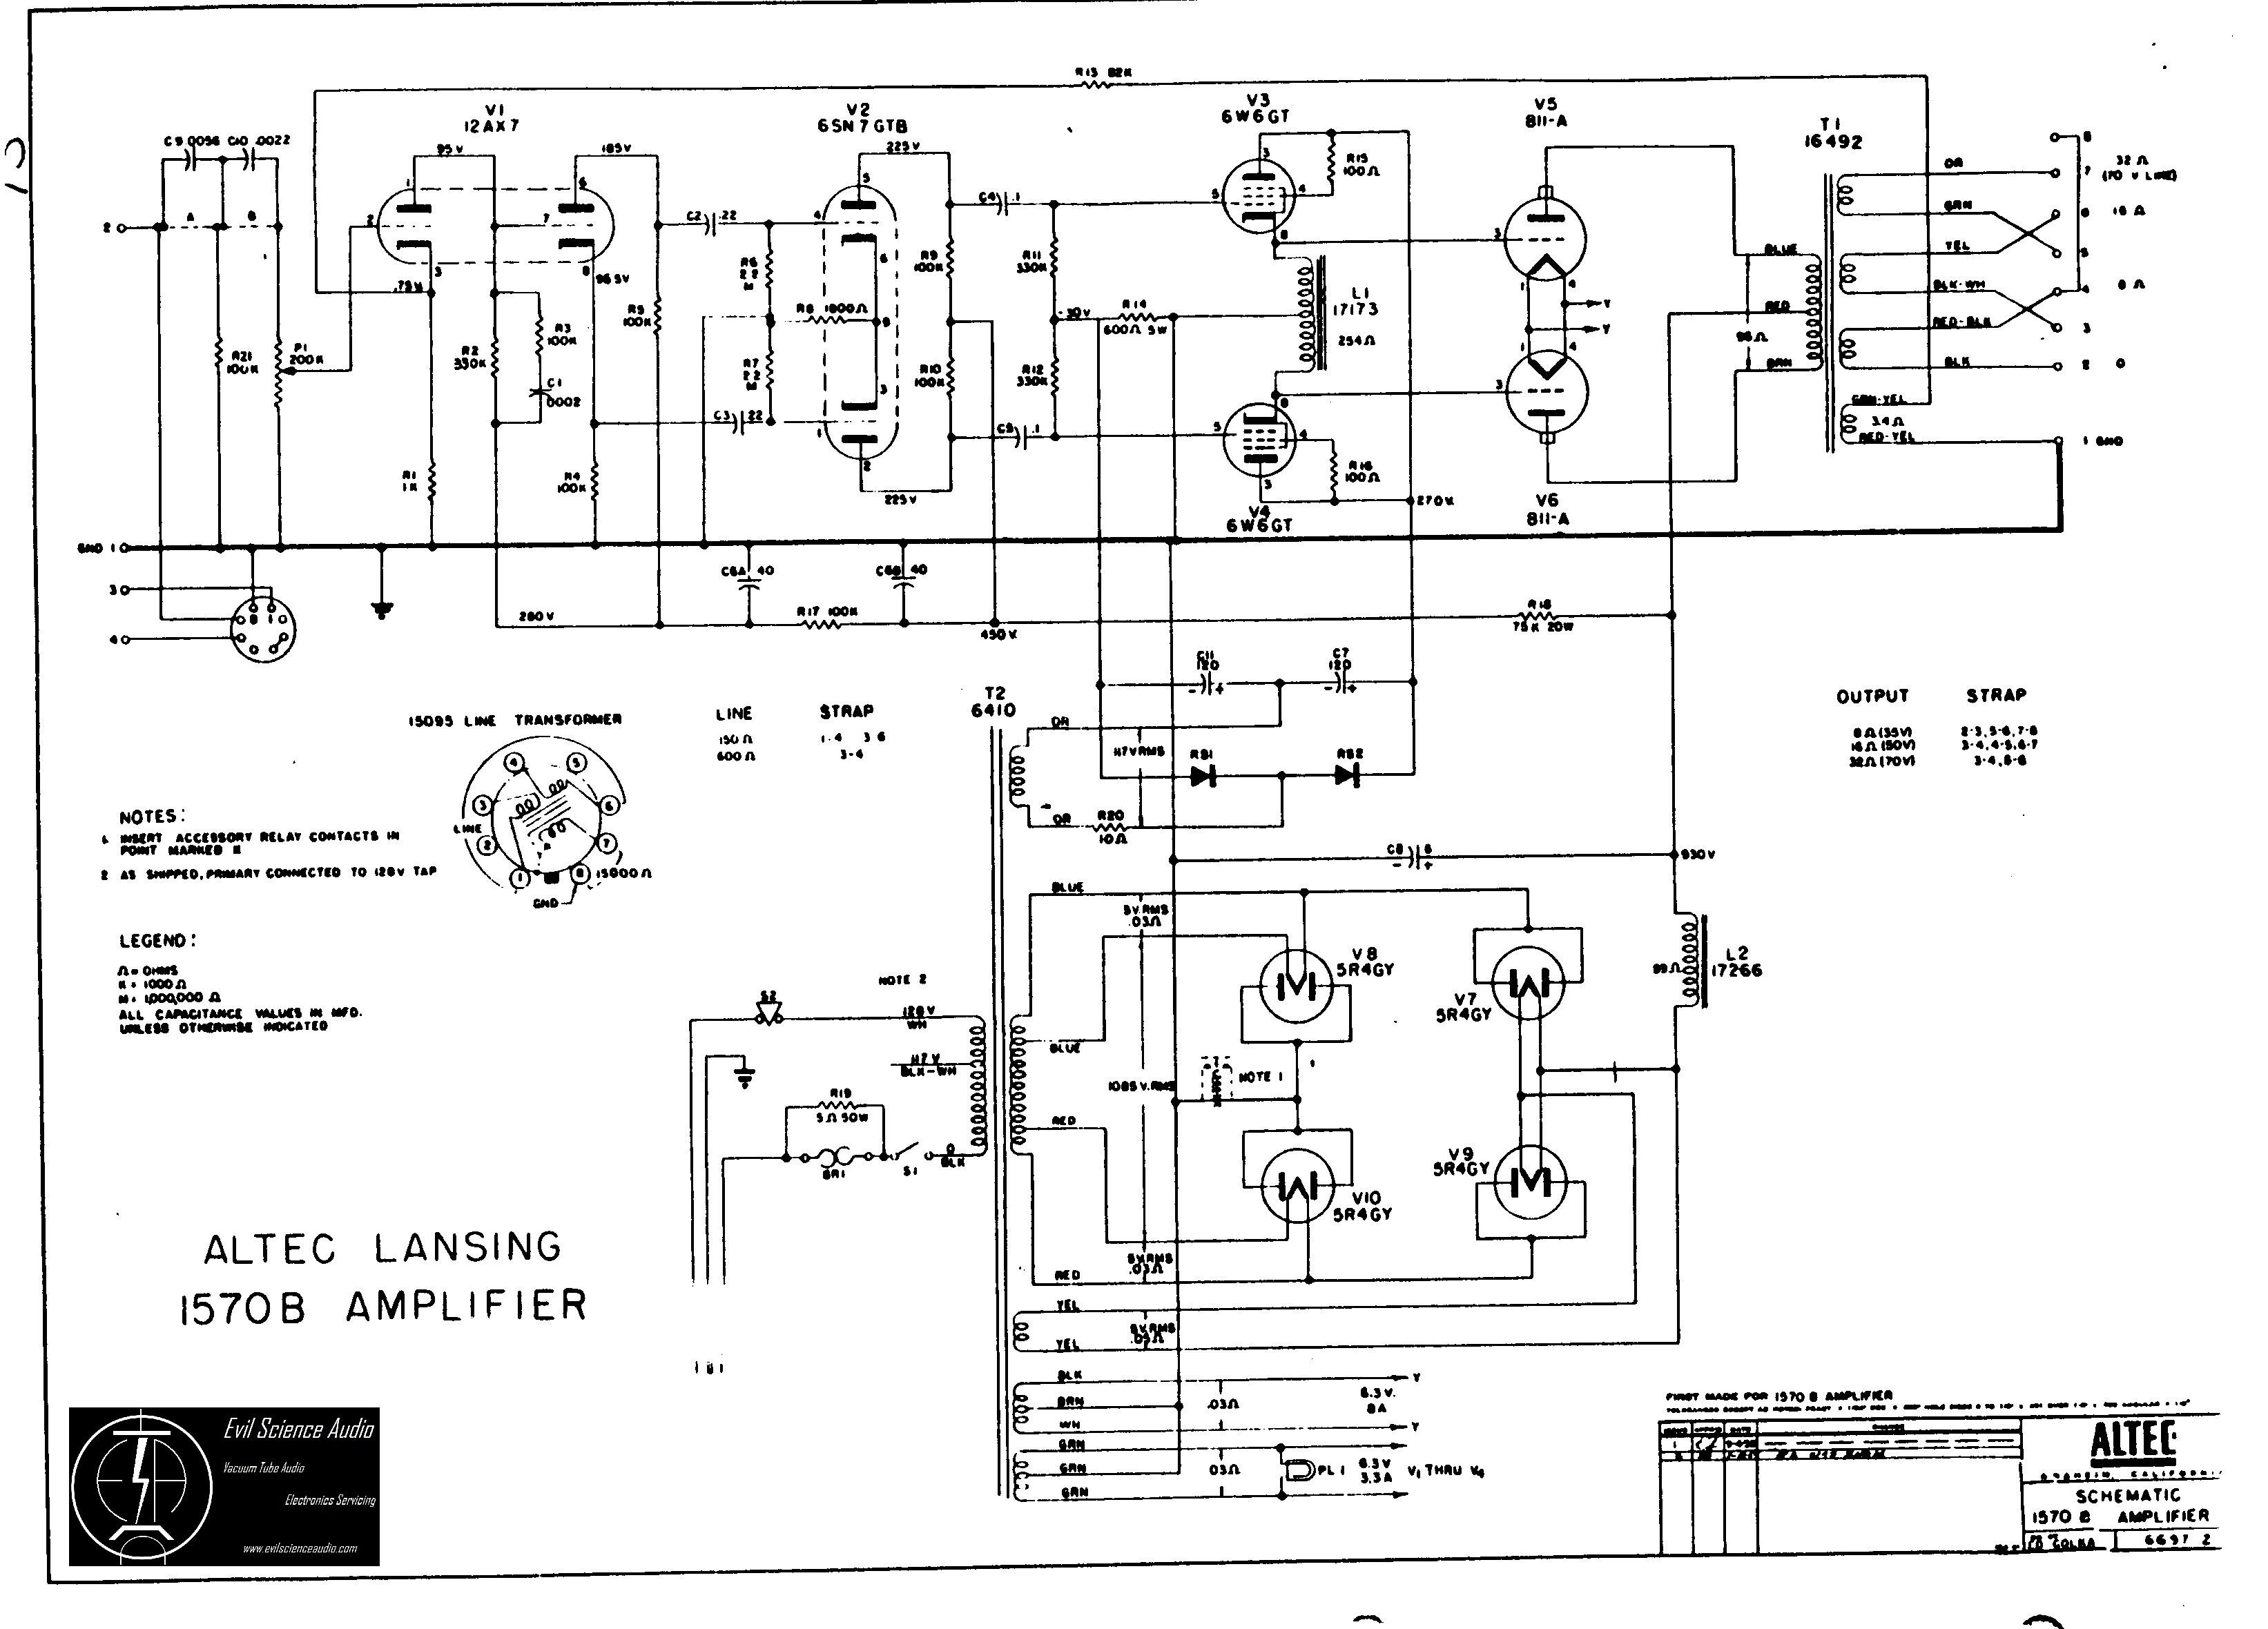 Wiring Diagram For Computer Speakers Schematic Diagrams 70 Volt Altec Lansing Speaker Schematics Data U2022 System